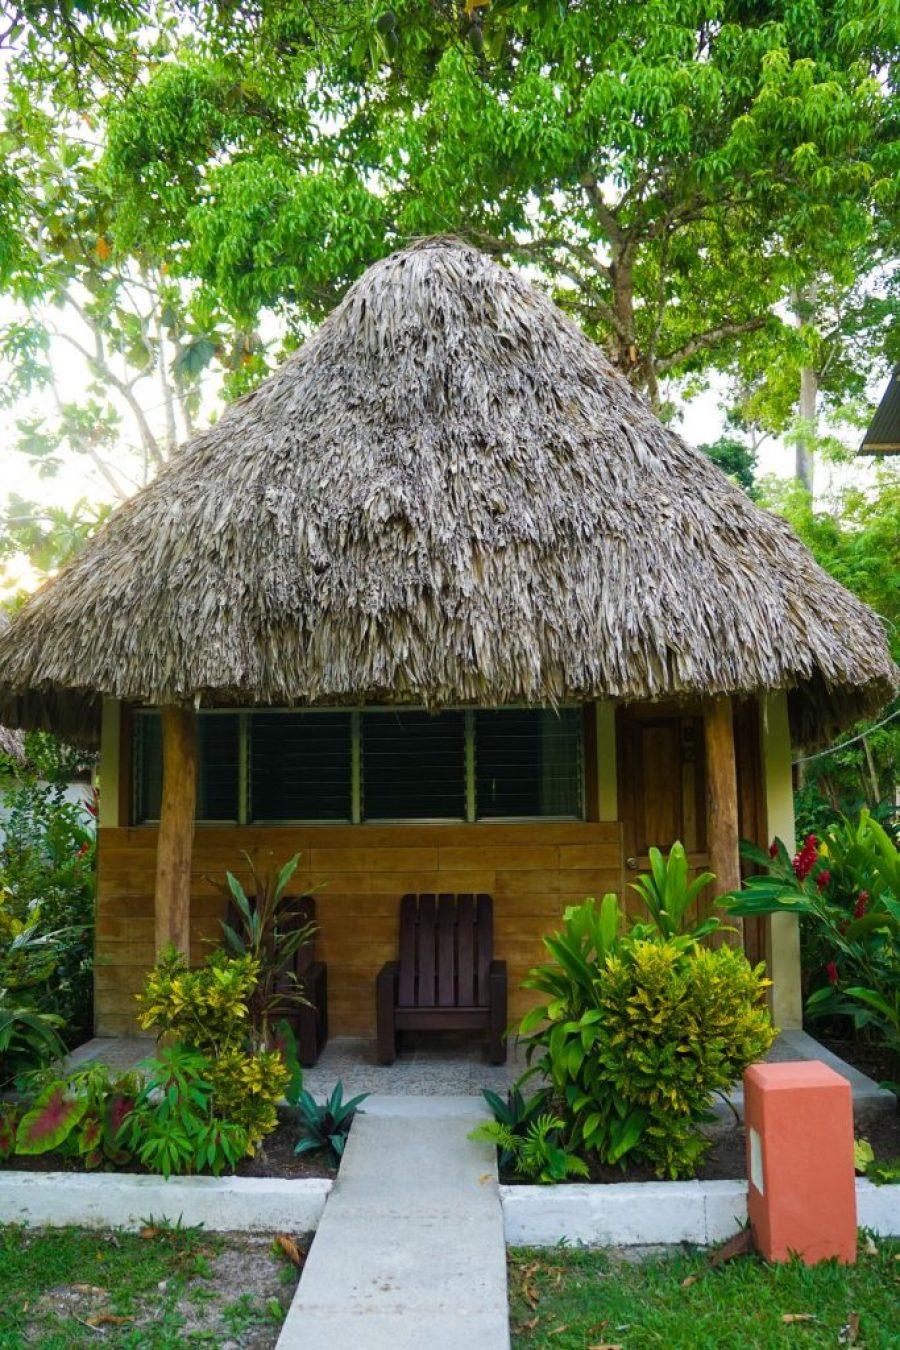 Tikal Hotels / Tikal Accommodation in a Tikal Jungle Lodge